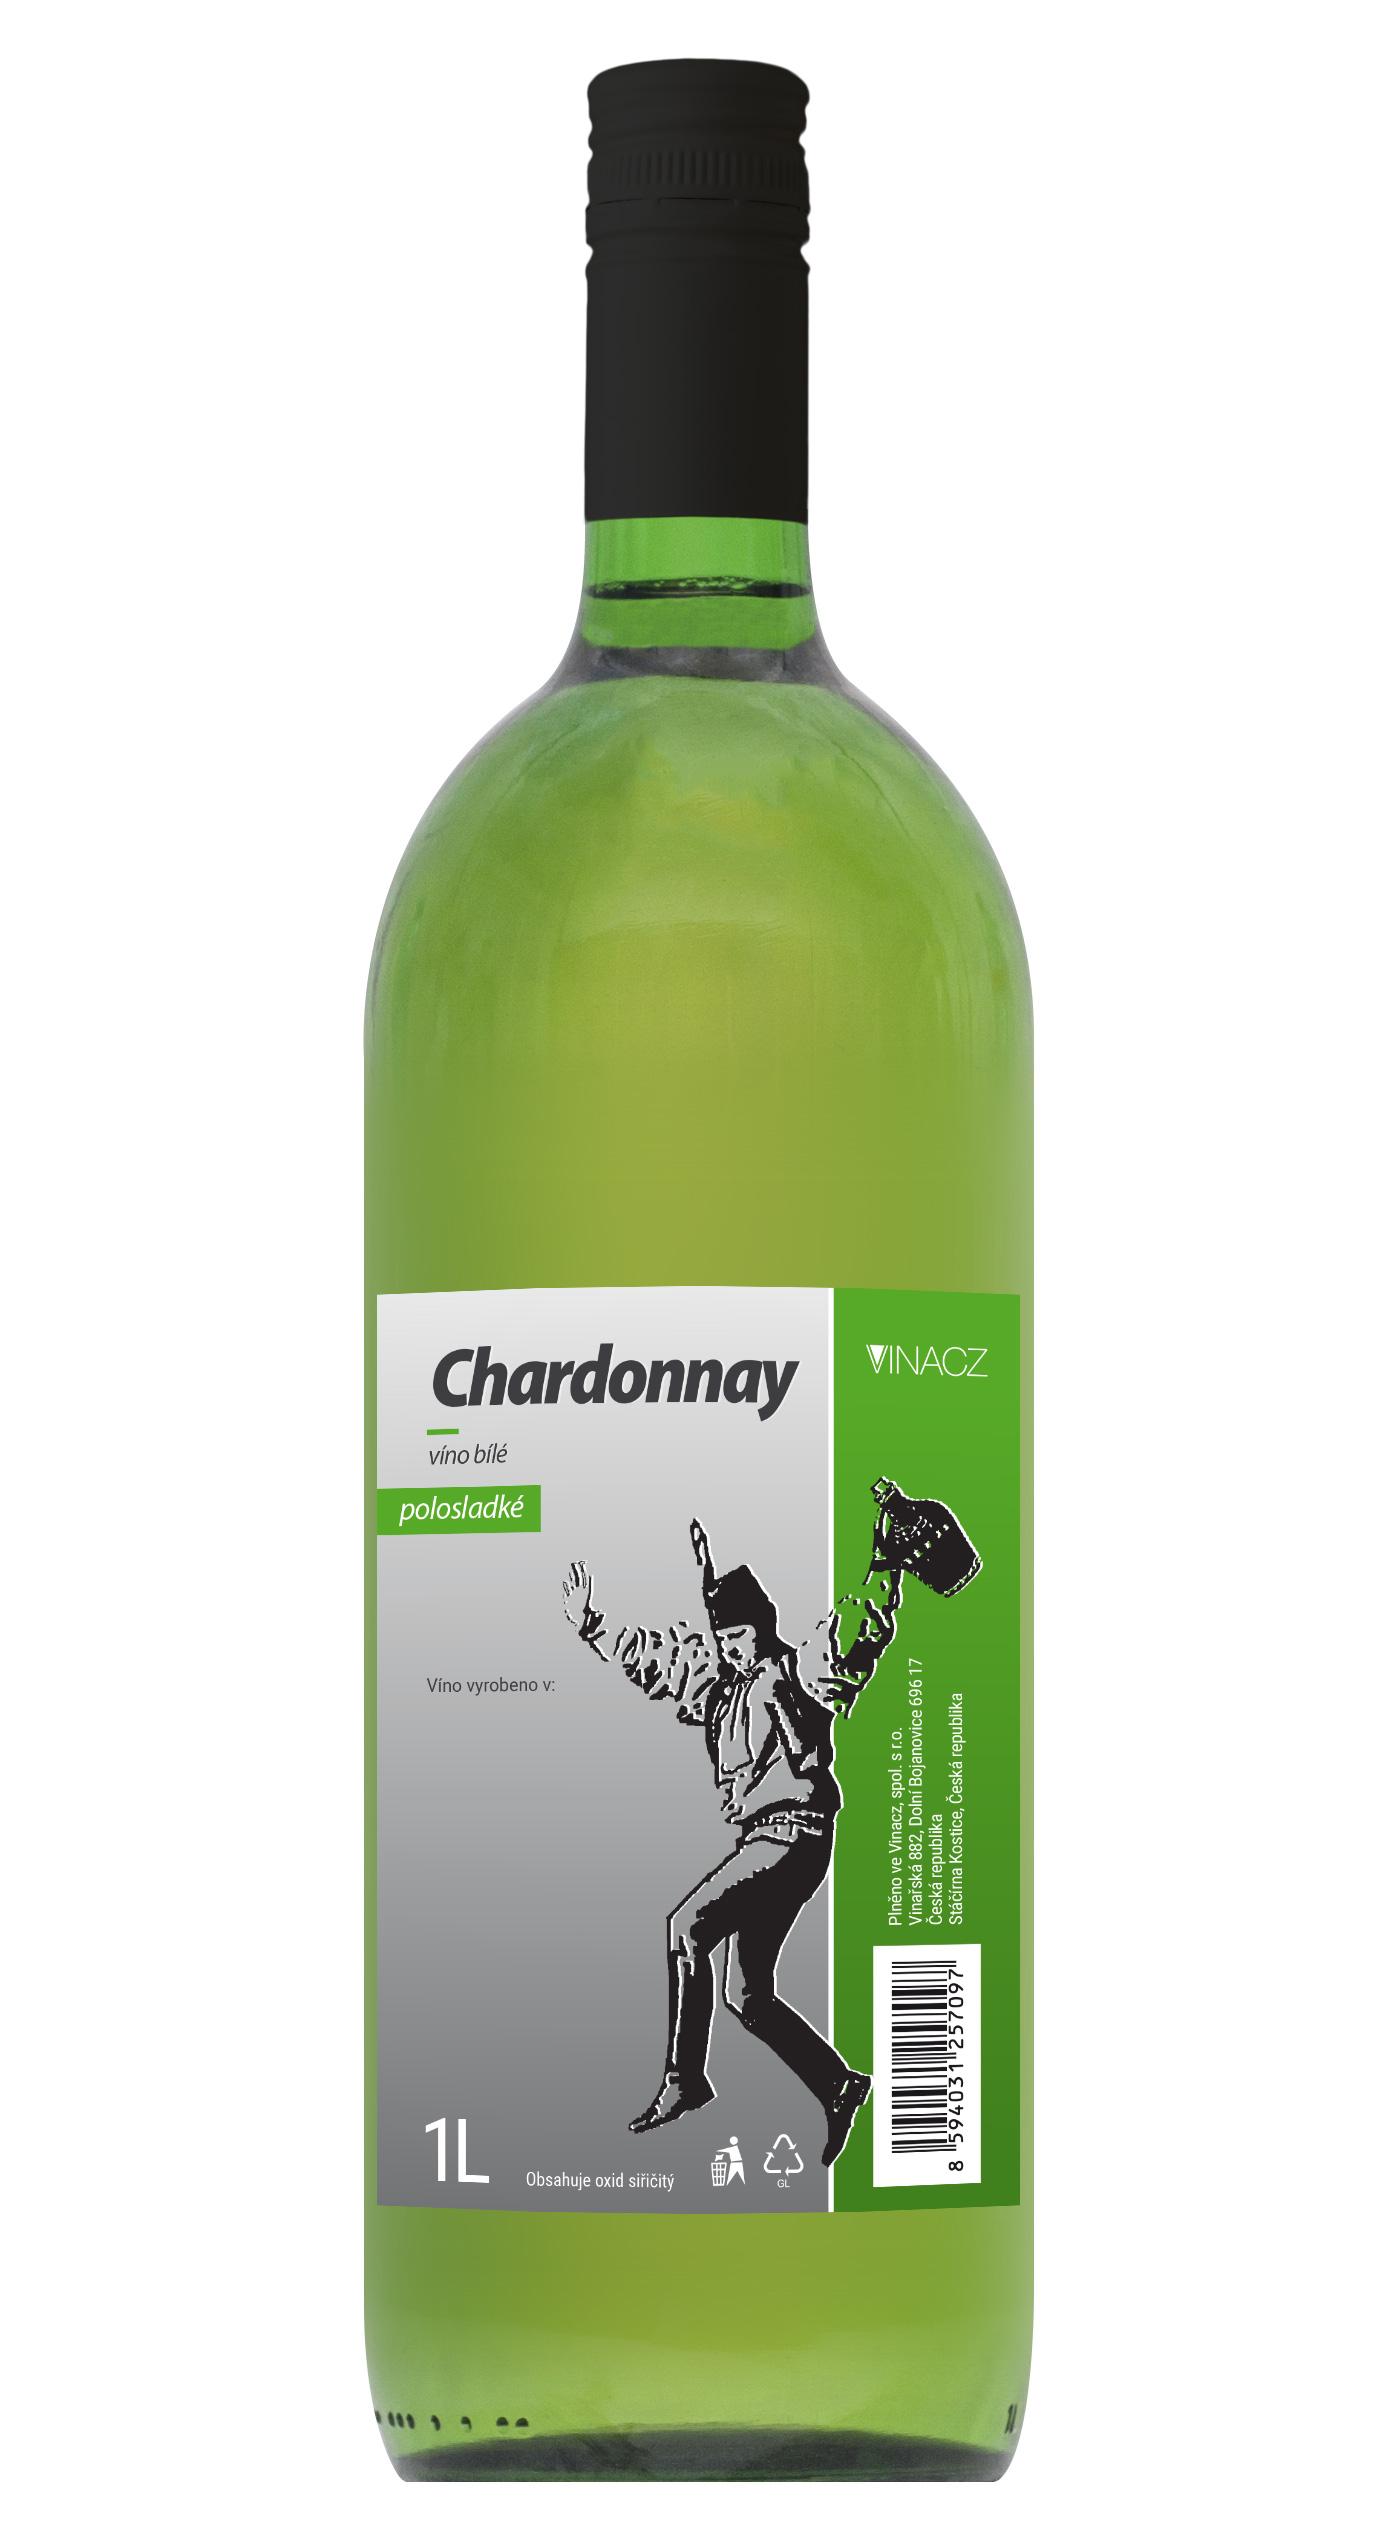 Chardonnay, polosladké